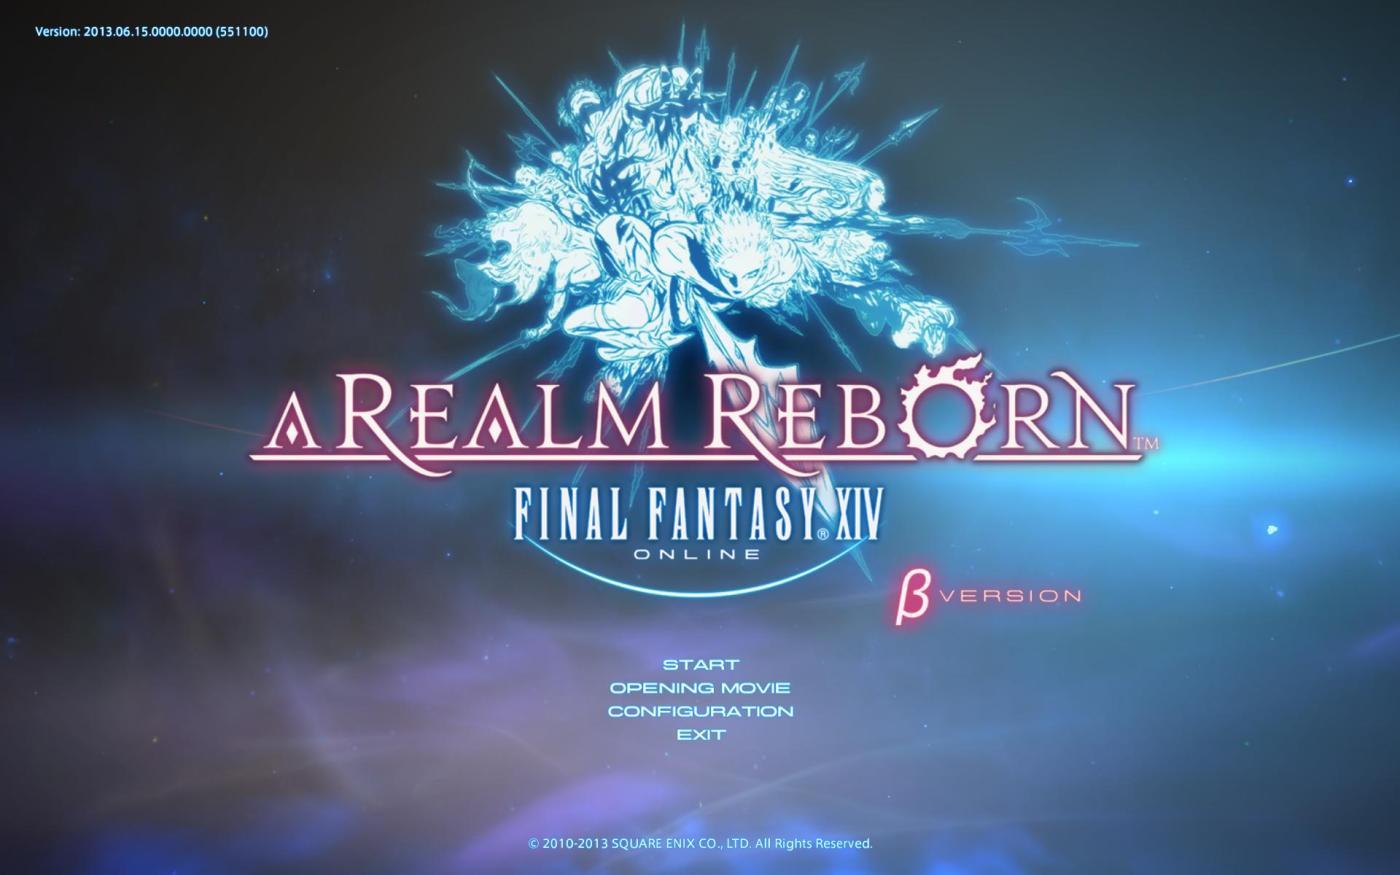 Final Fantasy XIV: A Realm Reborn Beta Phase 3 (June 14-16